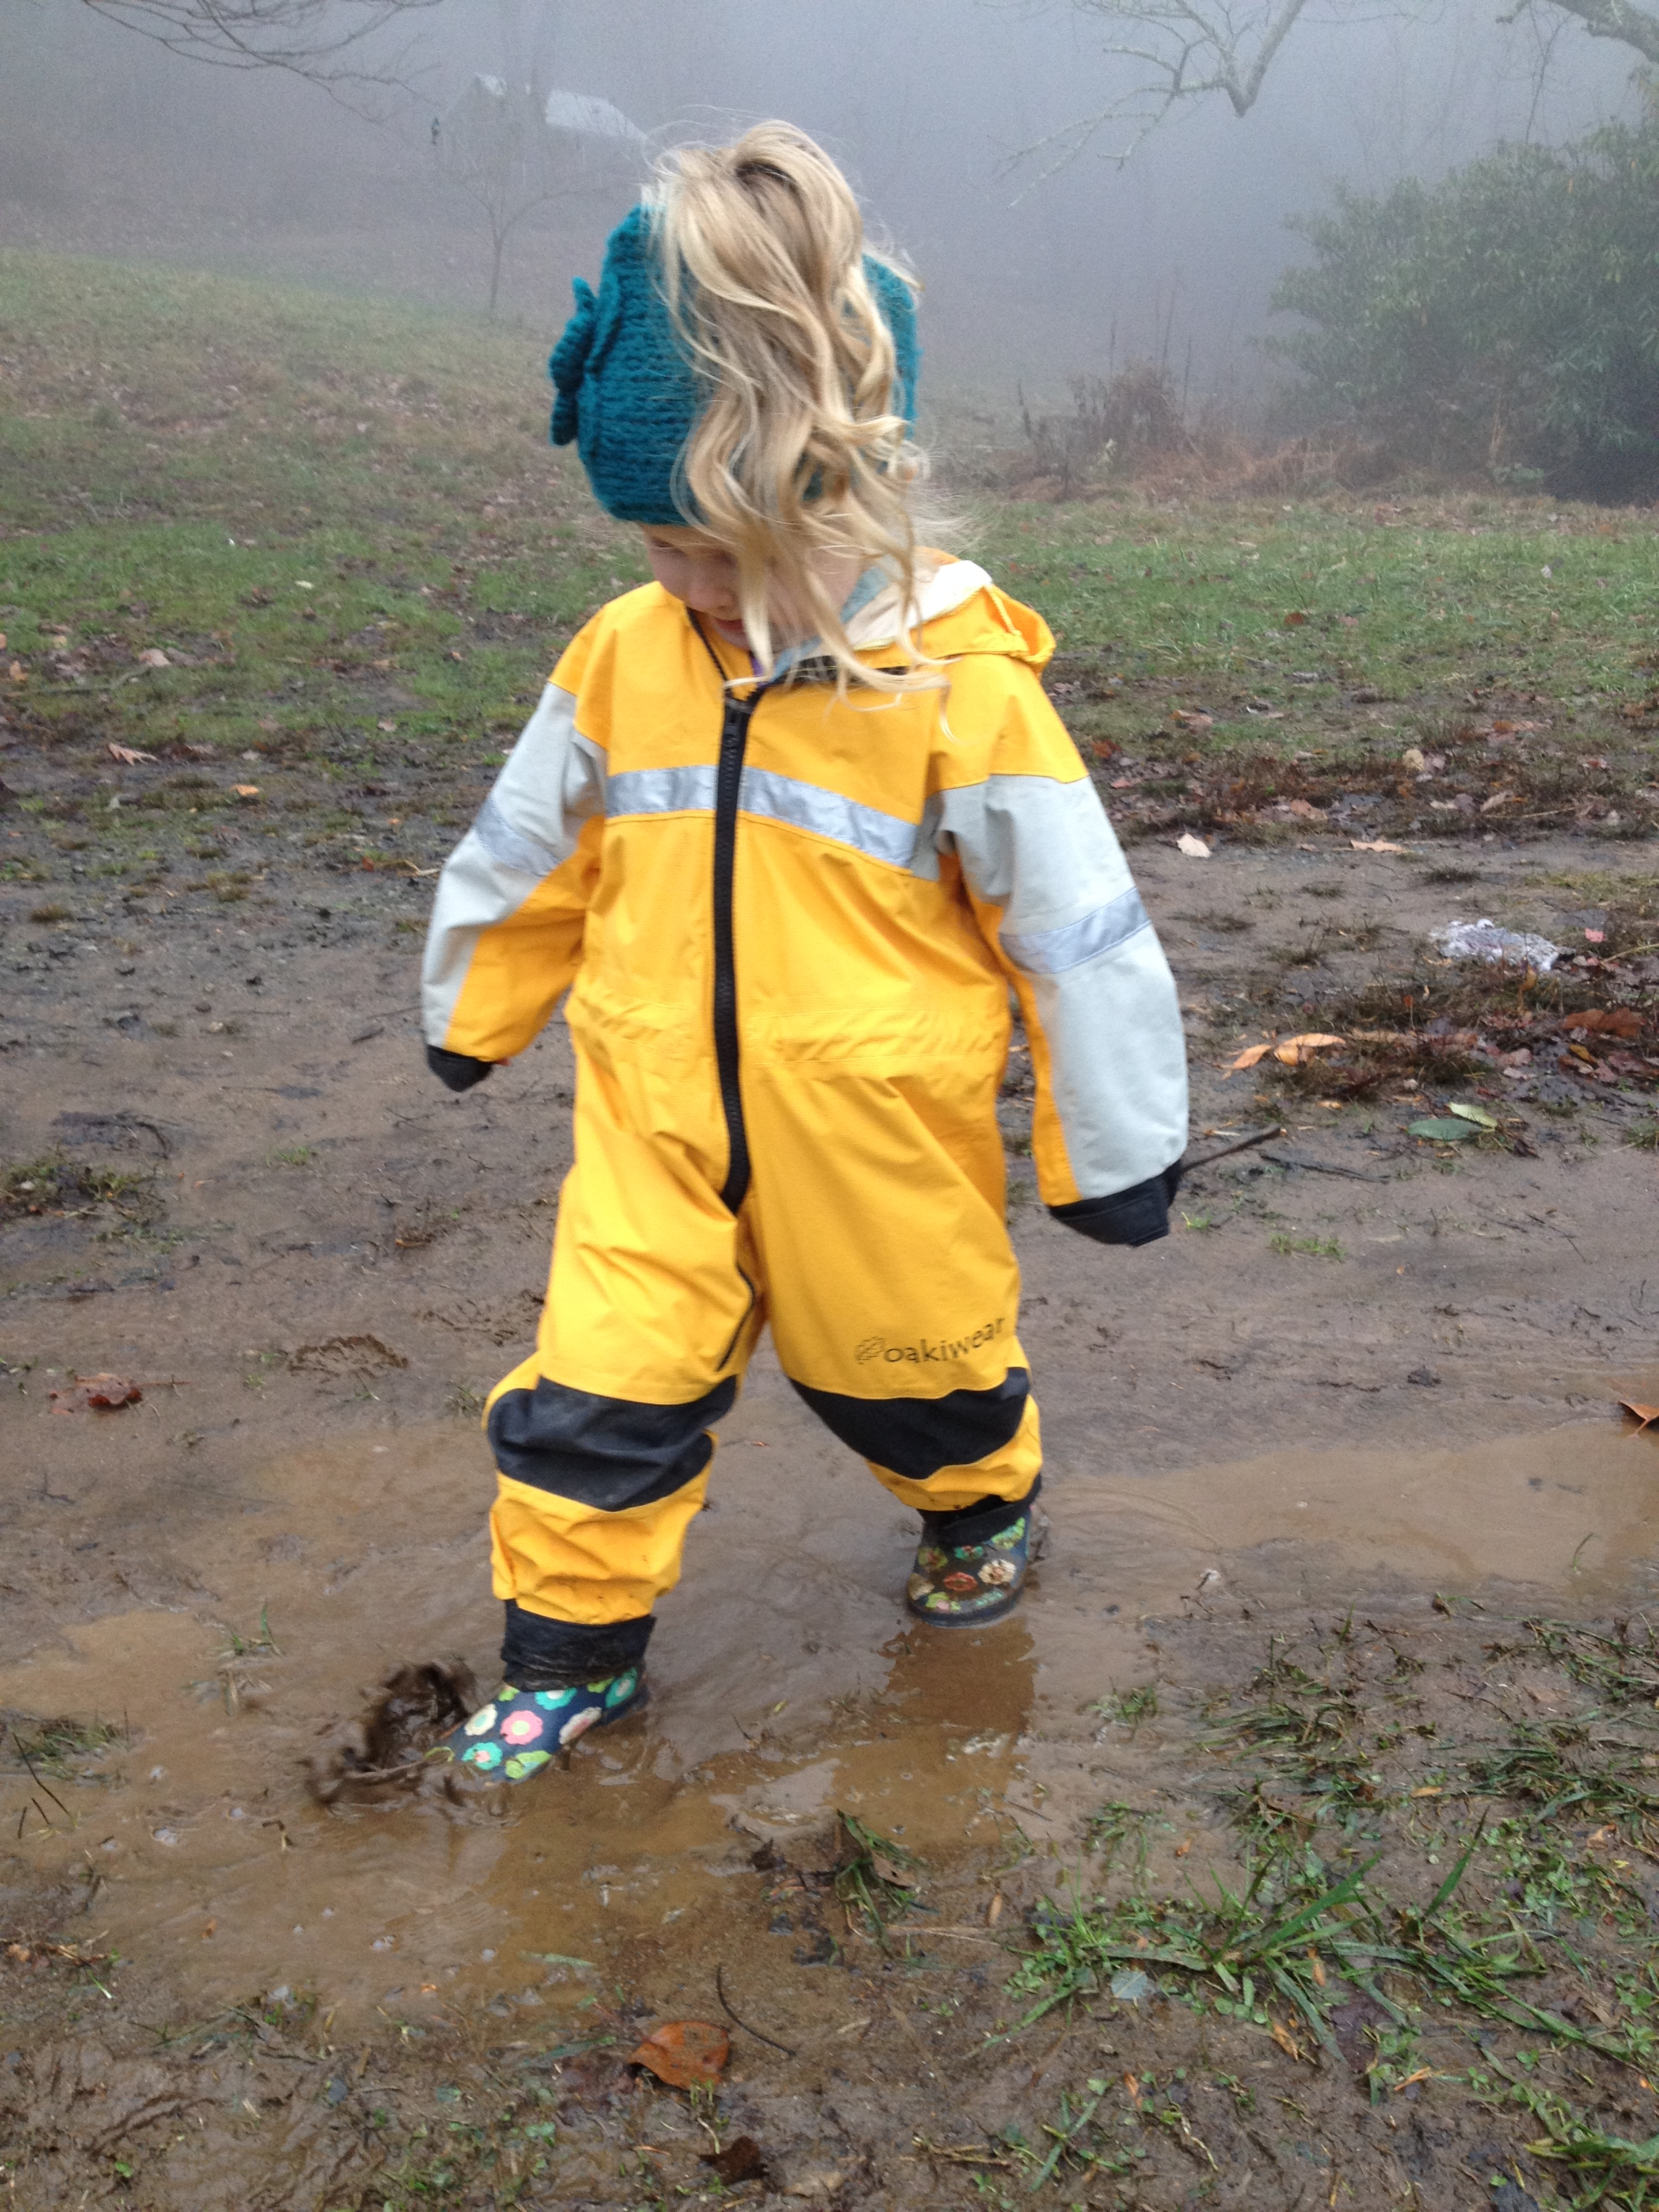 A focus on outdoor learning allows for deep, multi-sensory experience of seasonal rhythms